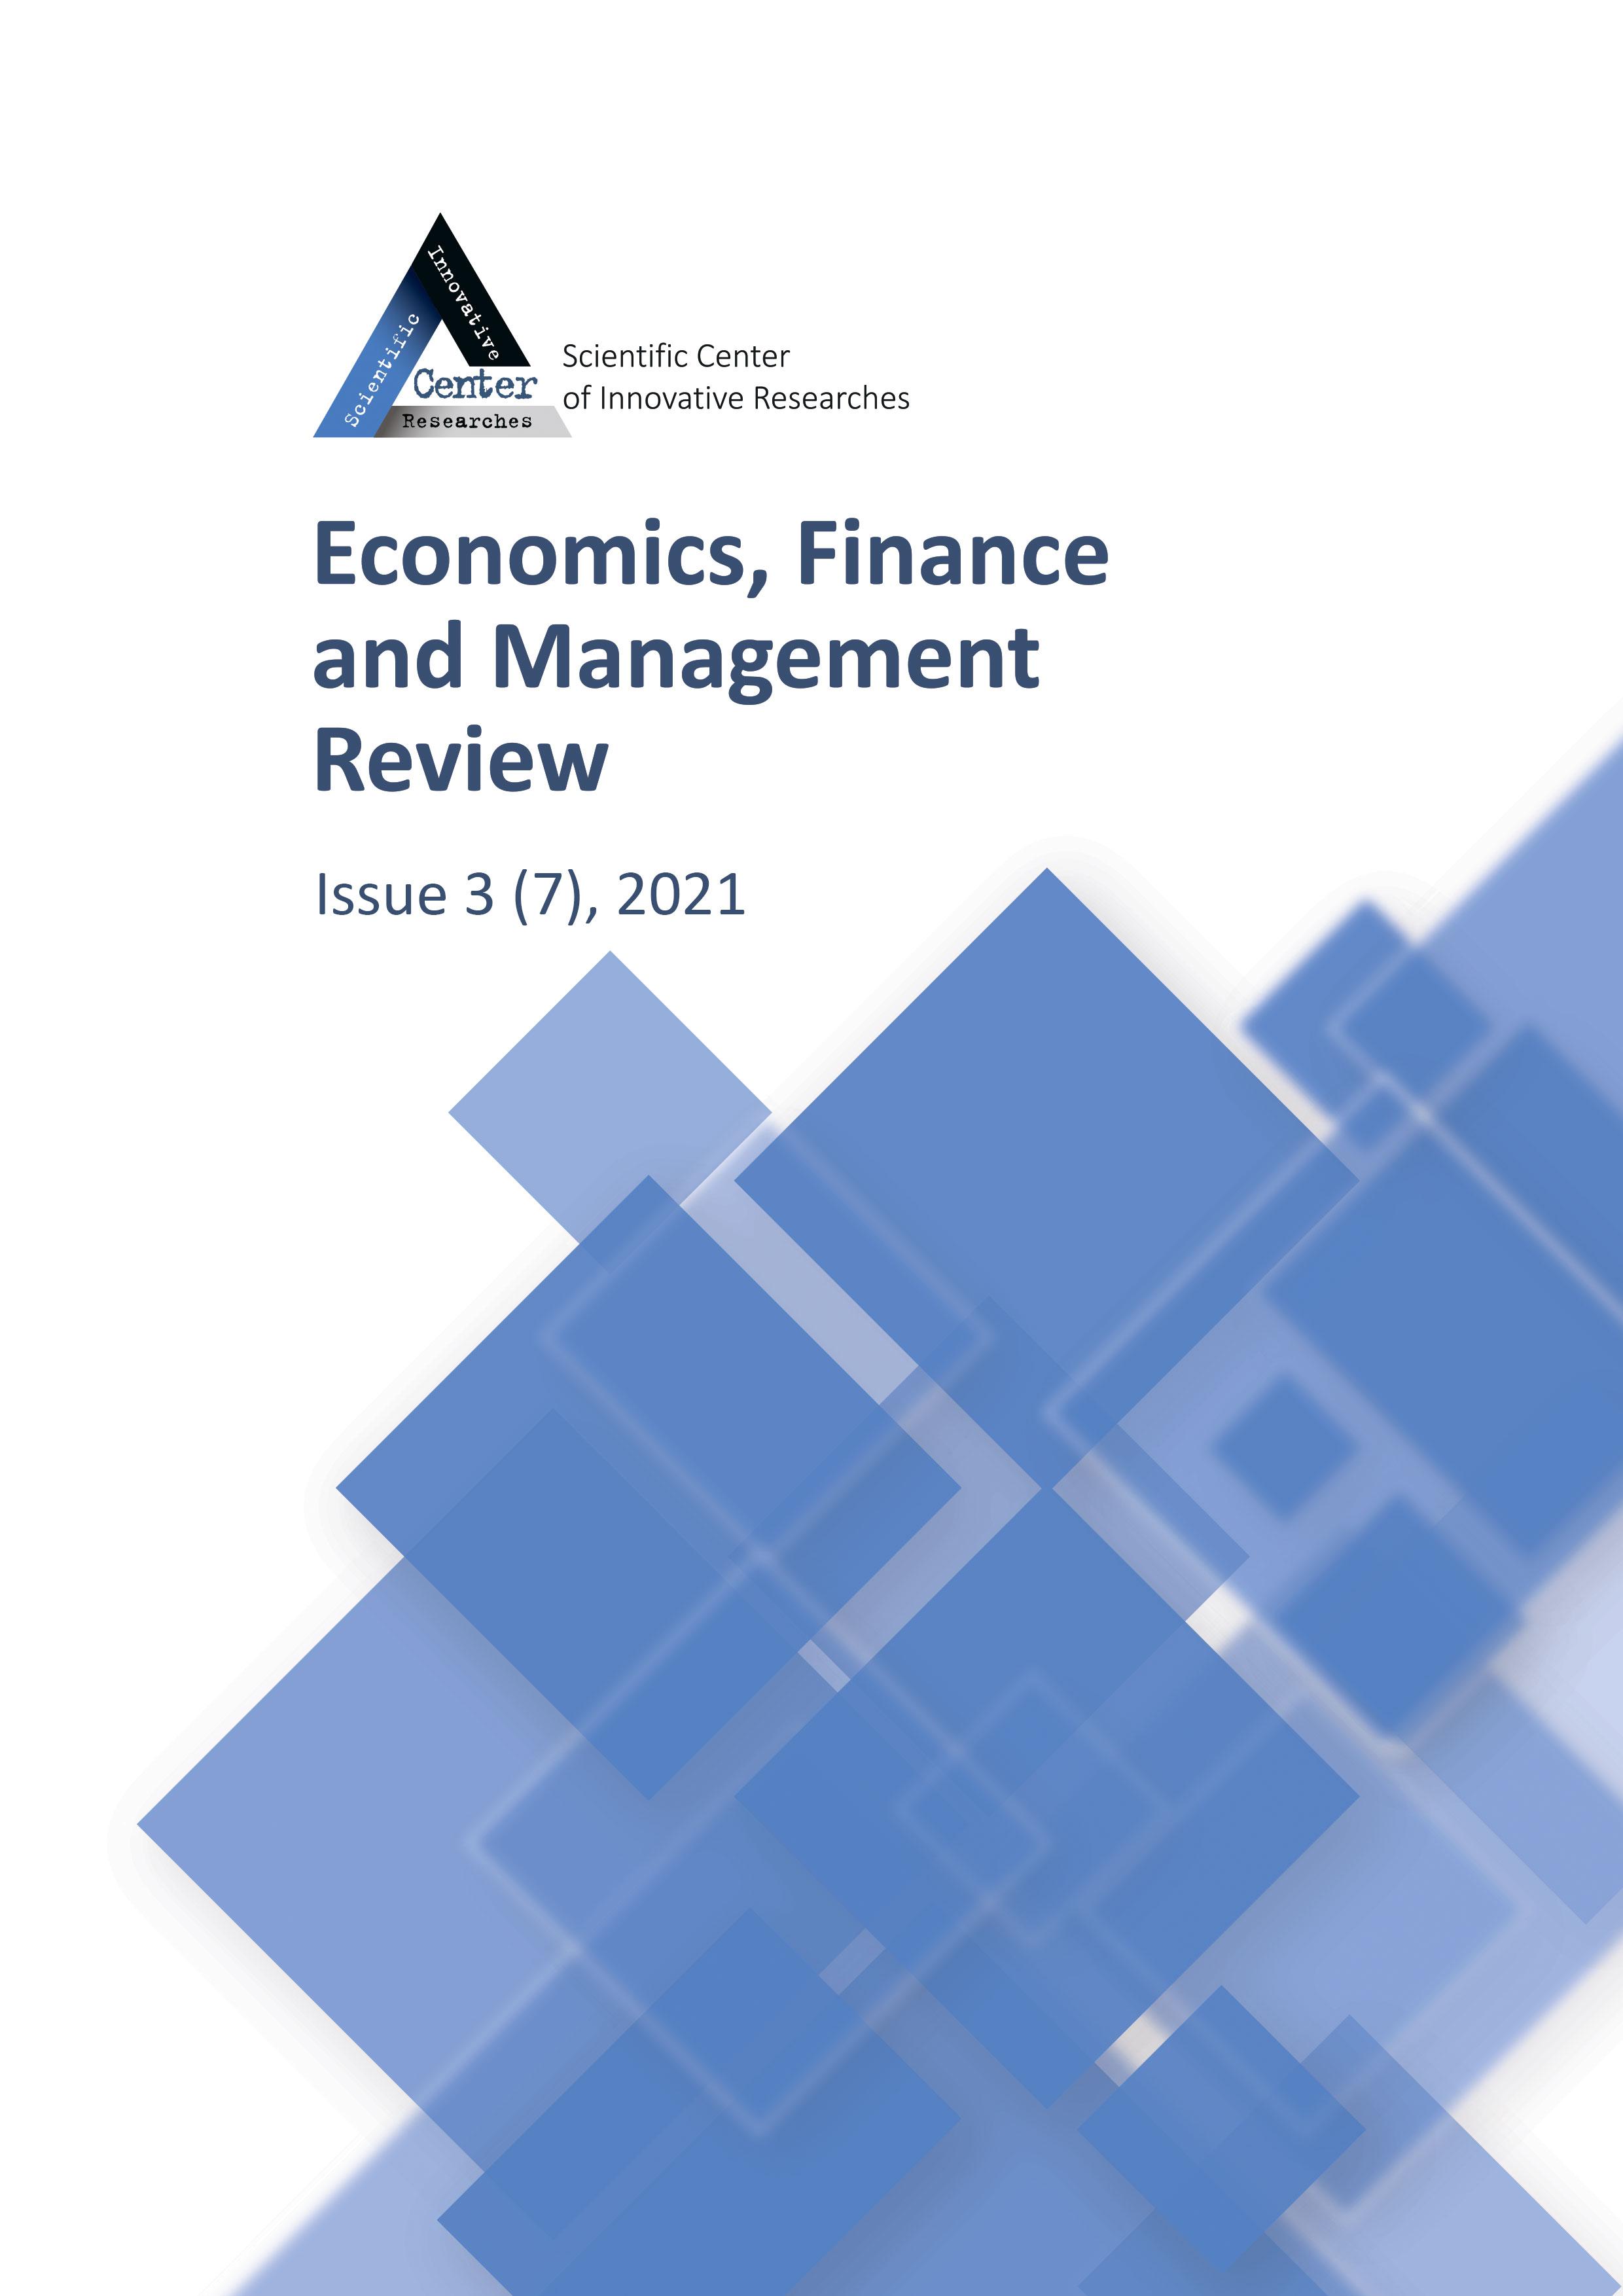 View No. 3 (2021): Economics, Finance And Management Review